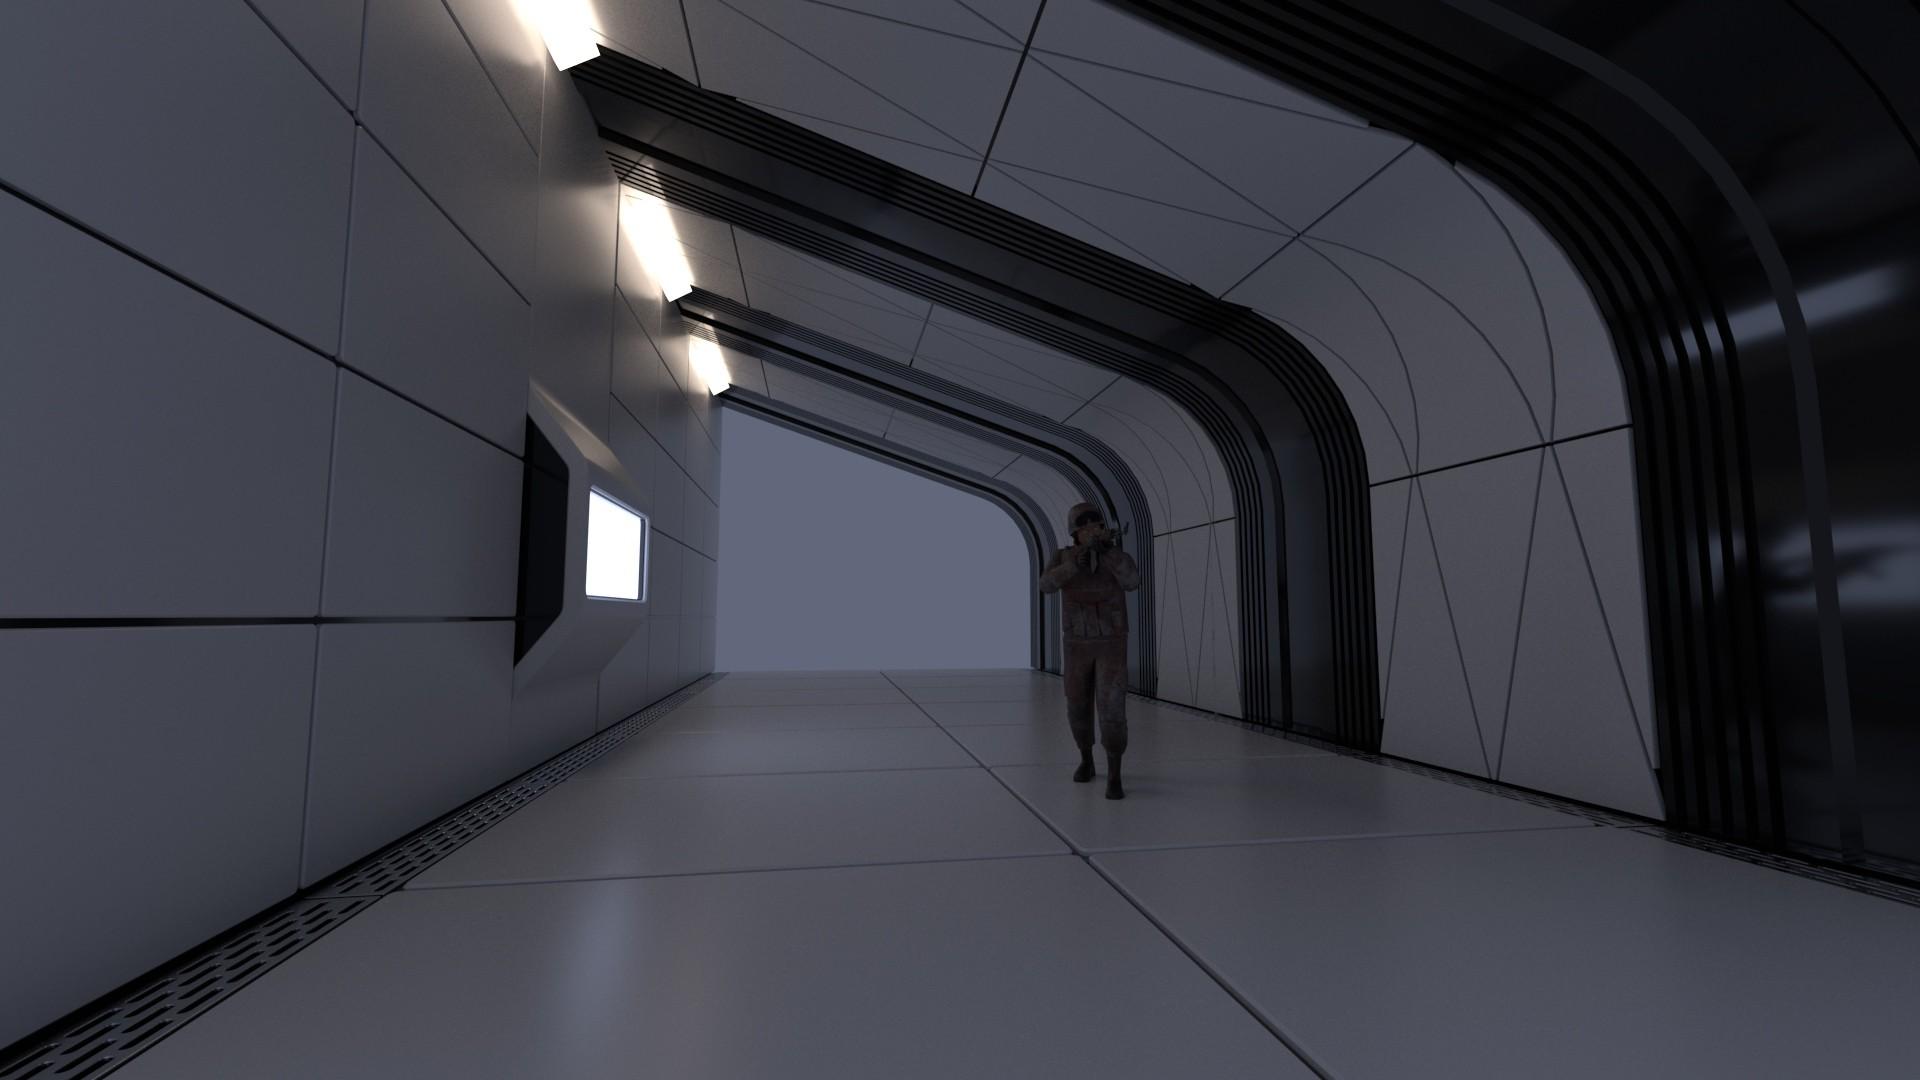 Iain gillespie corridor 3